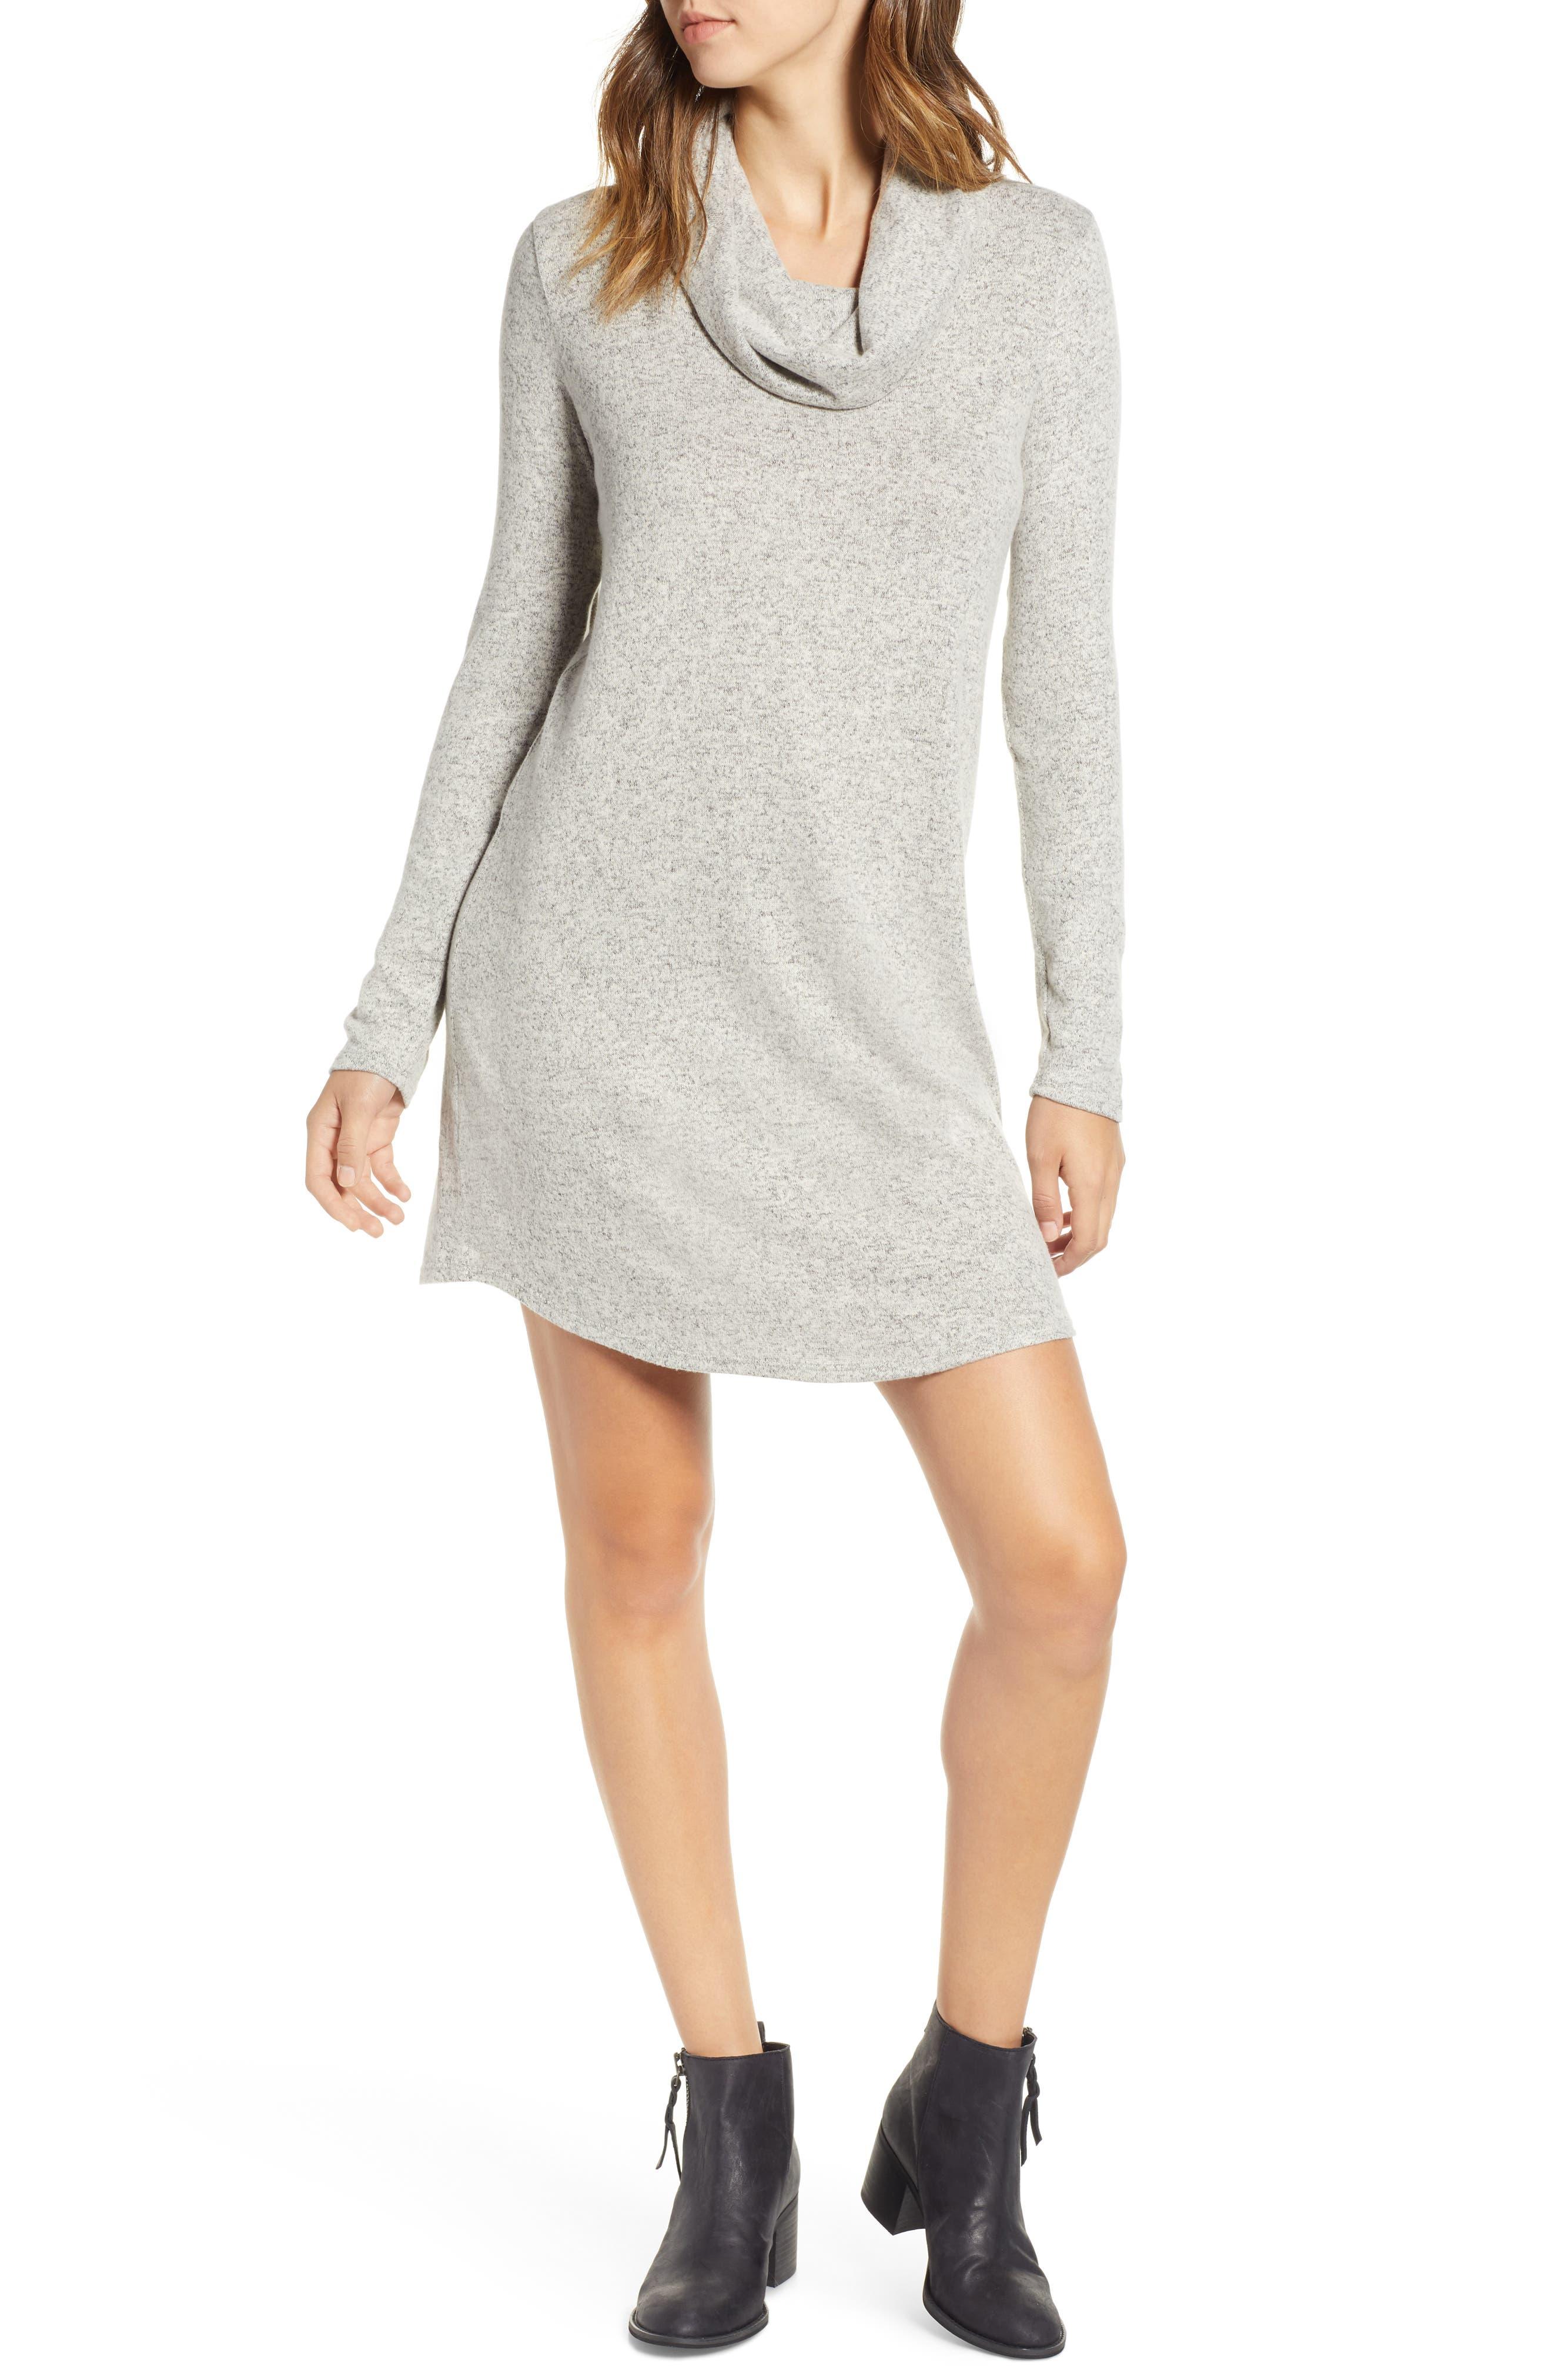 Socialite Cowl Neck Knit Dress, Beige